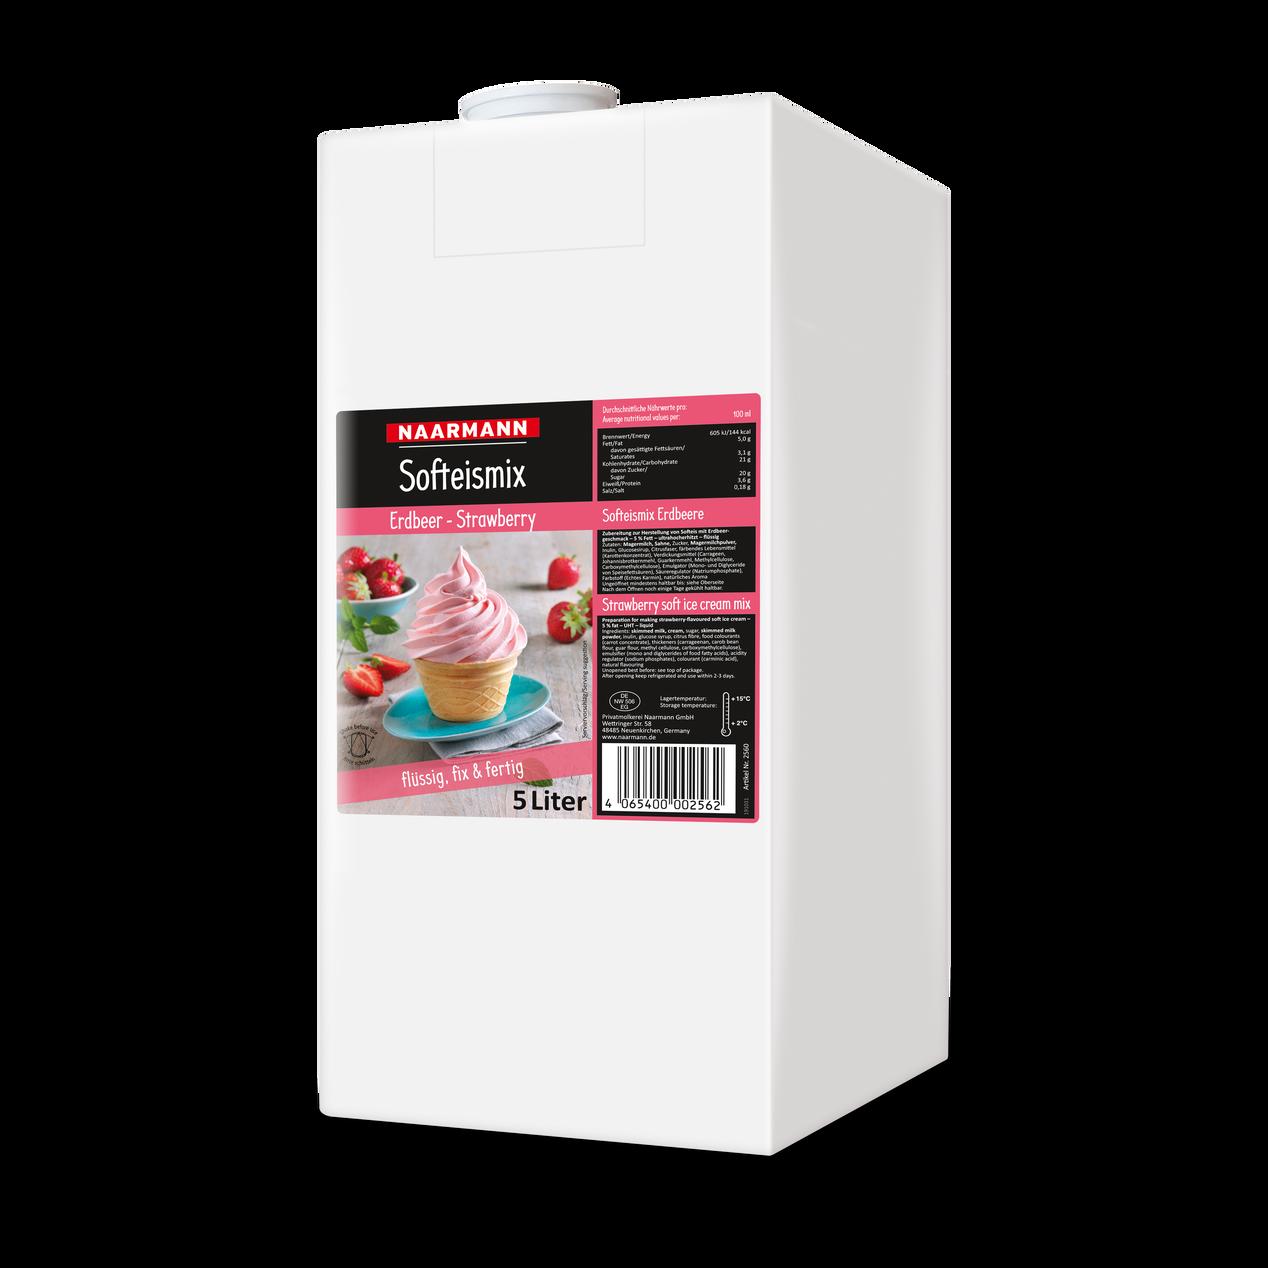 Erdbeer Softeismix Softeis Fertigmix Flüssigmix Softeis flüssig 2x4,5L